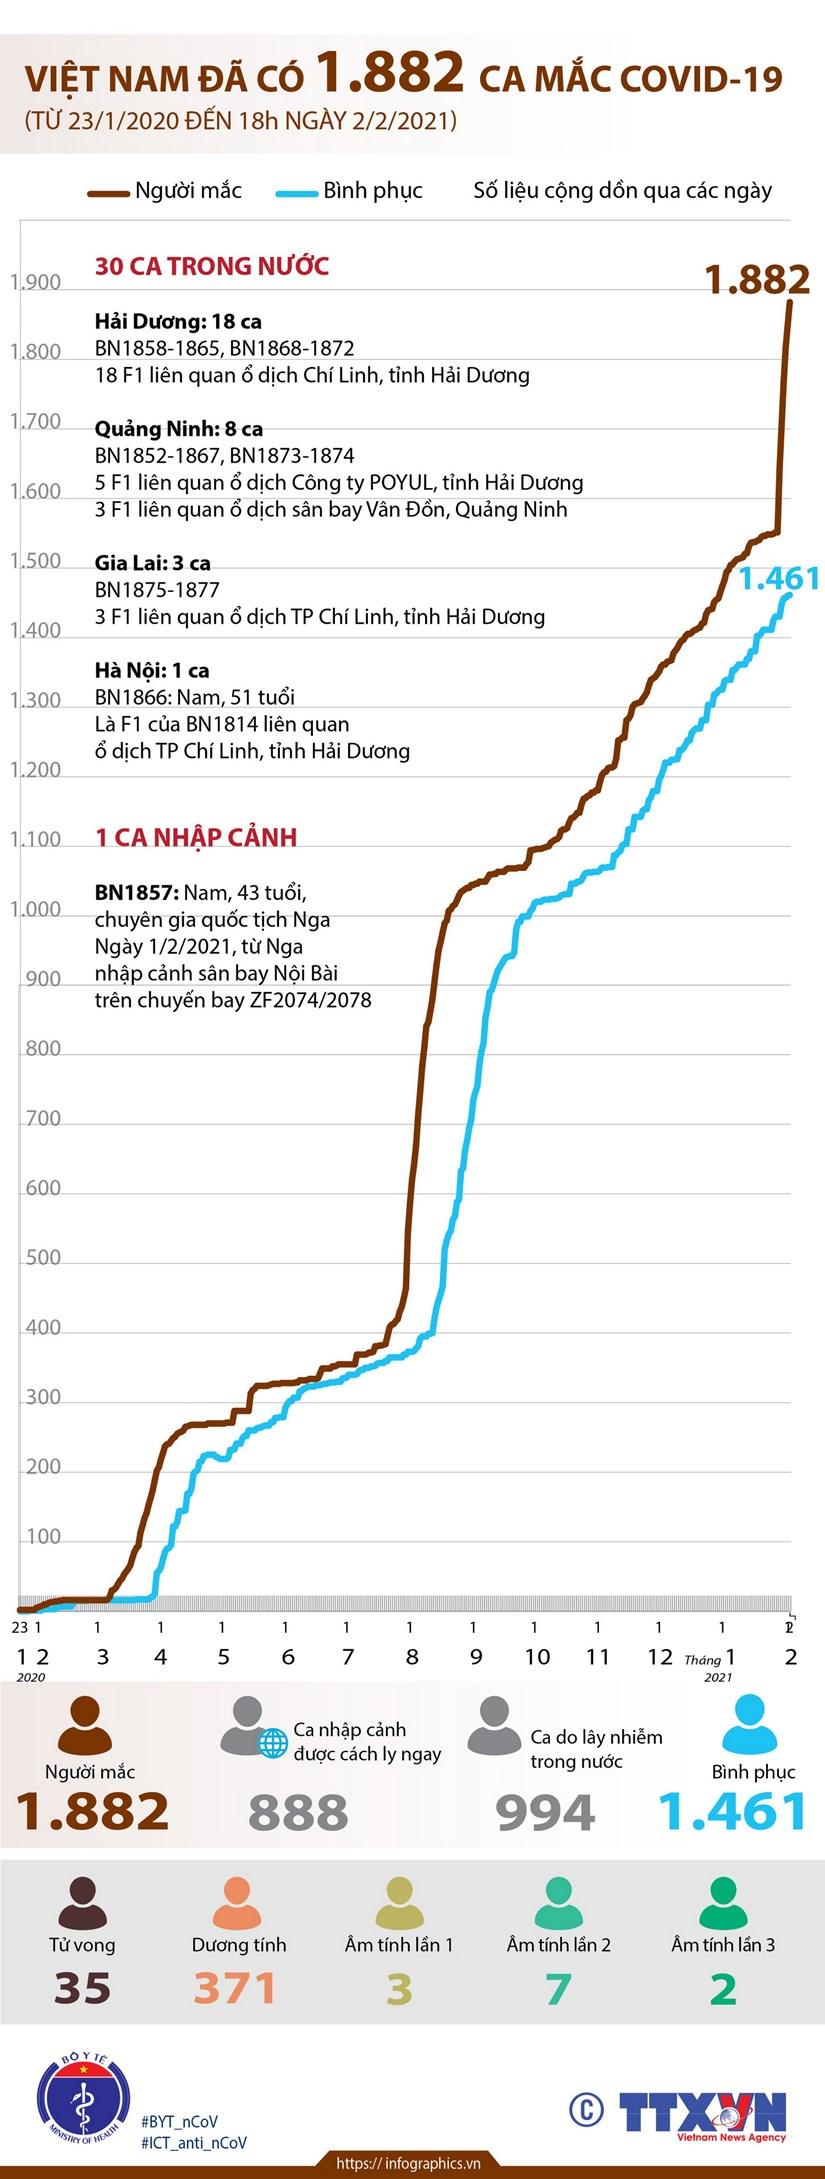 [Infographics] Viet Nam da co 1.882 ca mac COVID-19 hinh anh 1